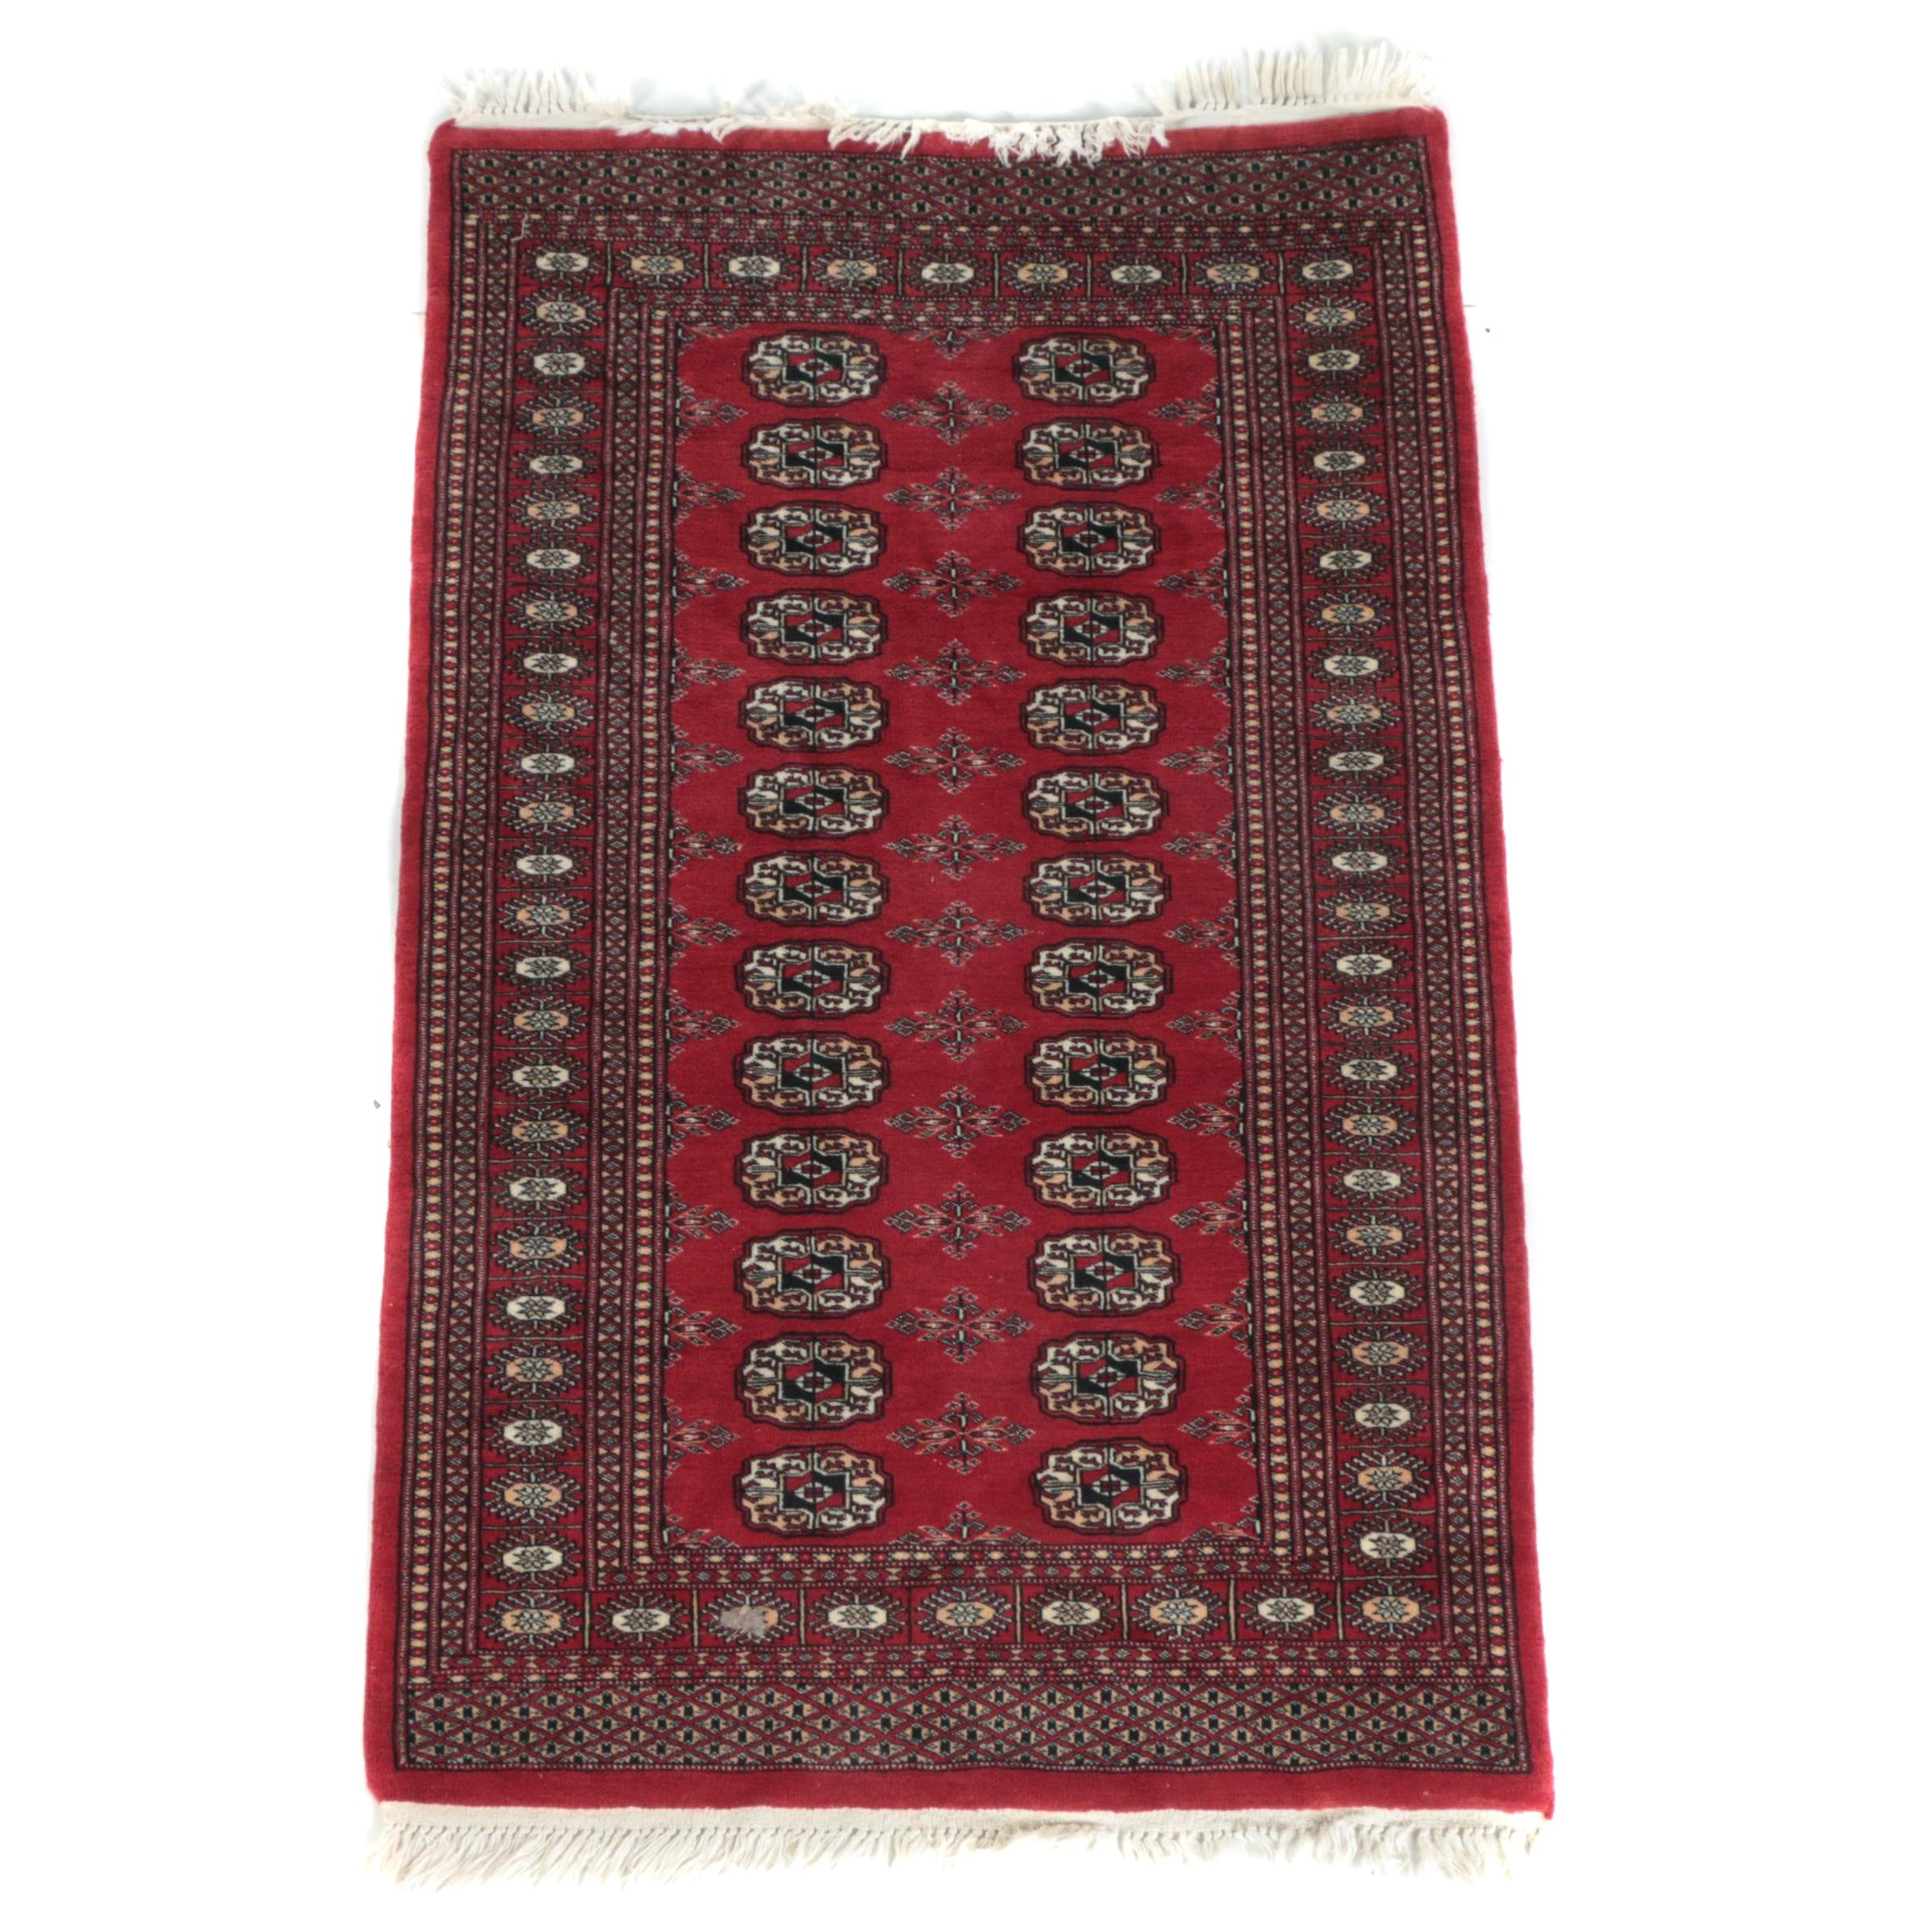 Hand-Knotted Afghani Bokhara Area Rug